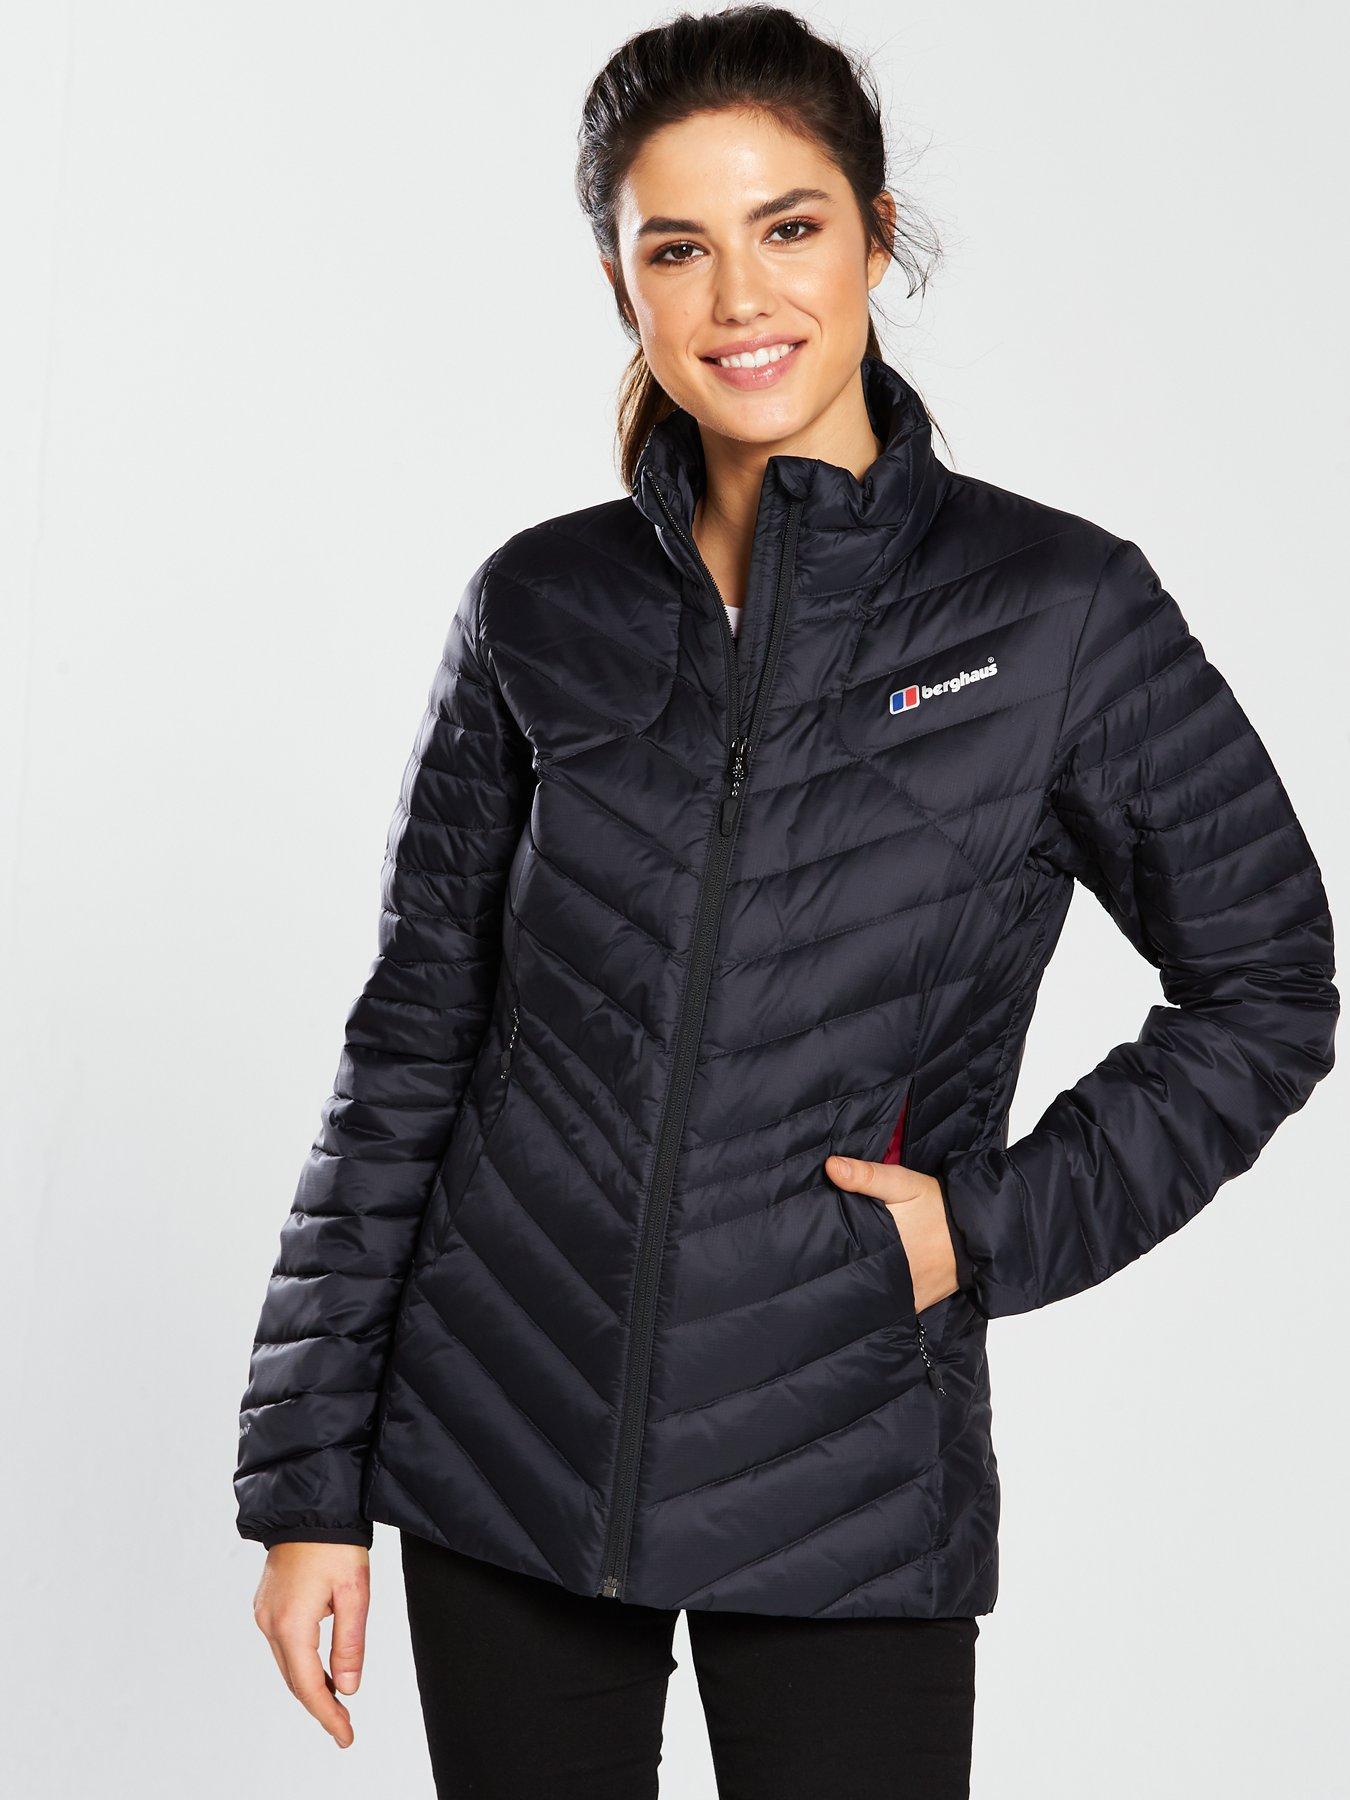 9dccf464 Winter Ladies Very Jackets Womens Coats amp; xqPRpP0Y